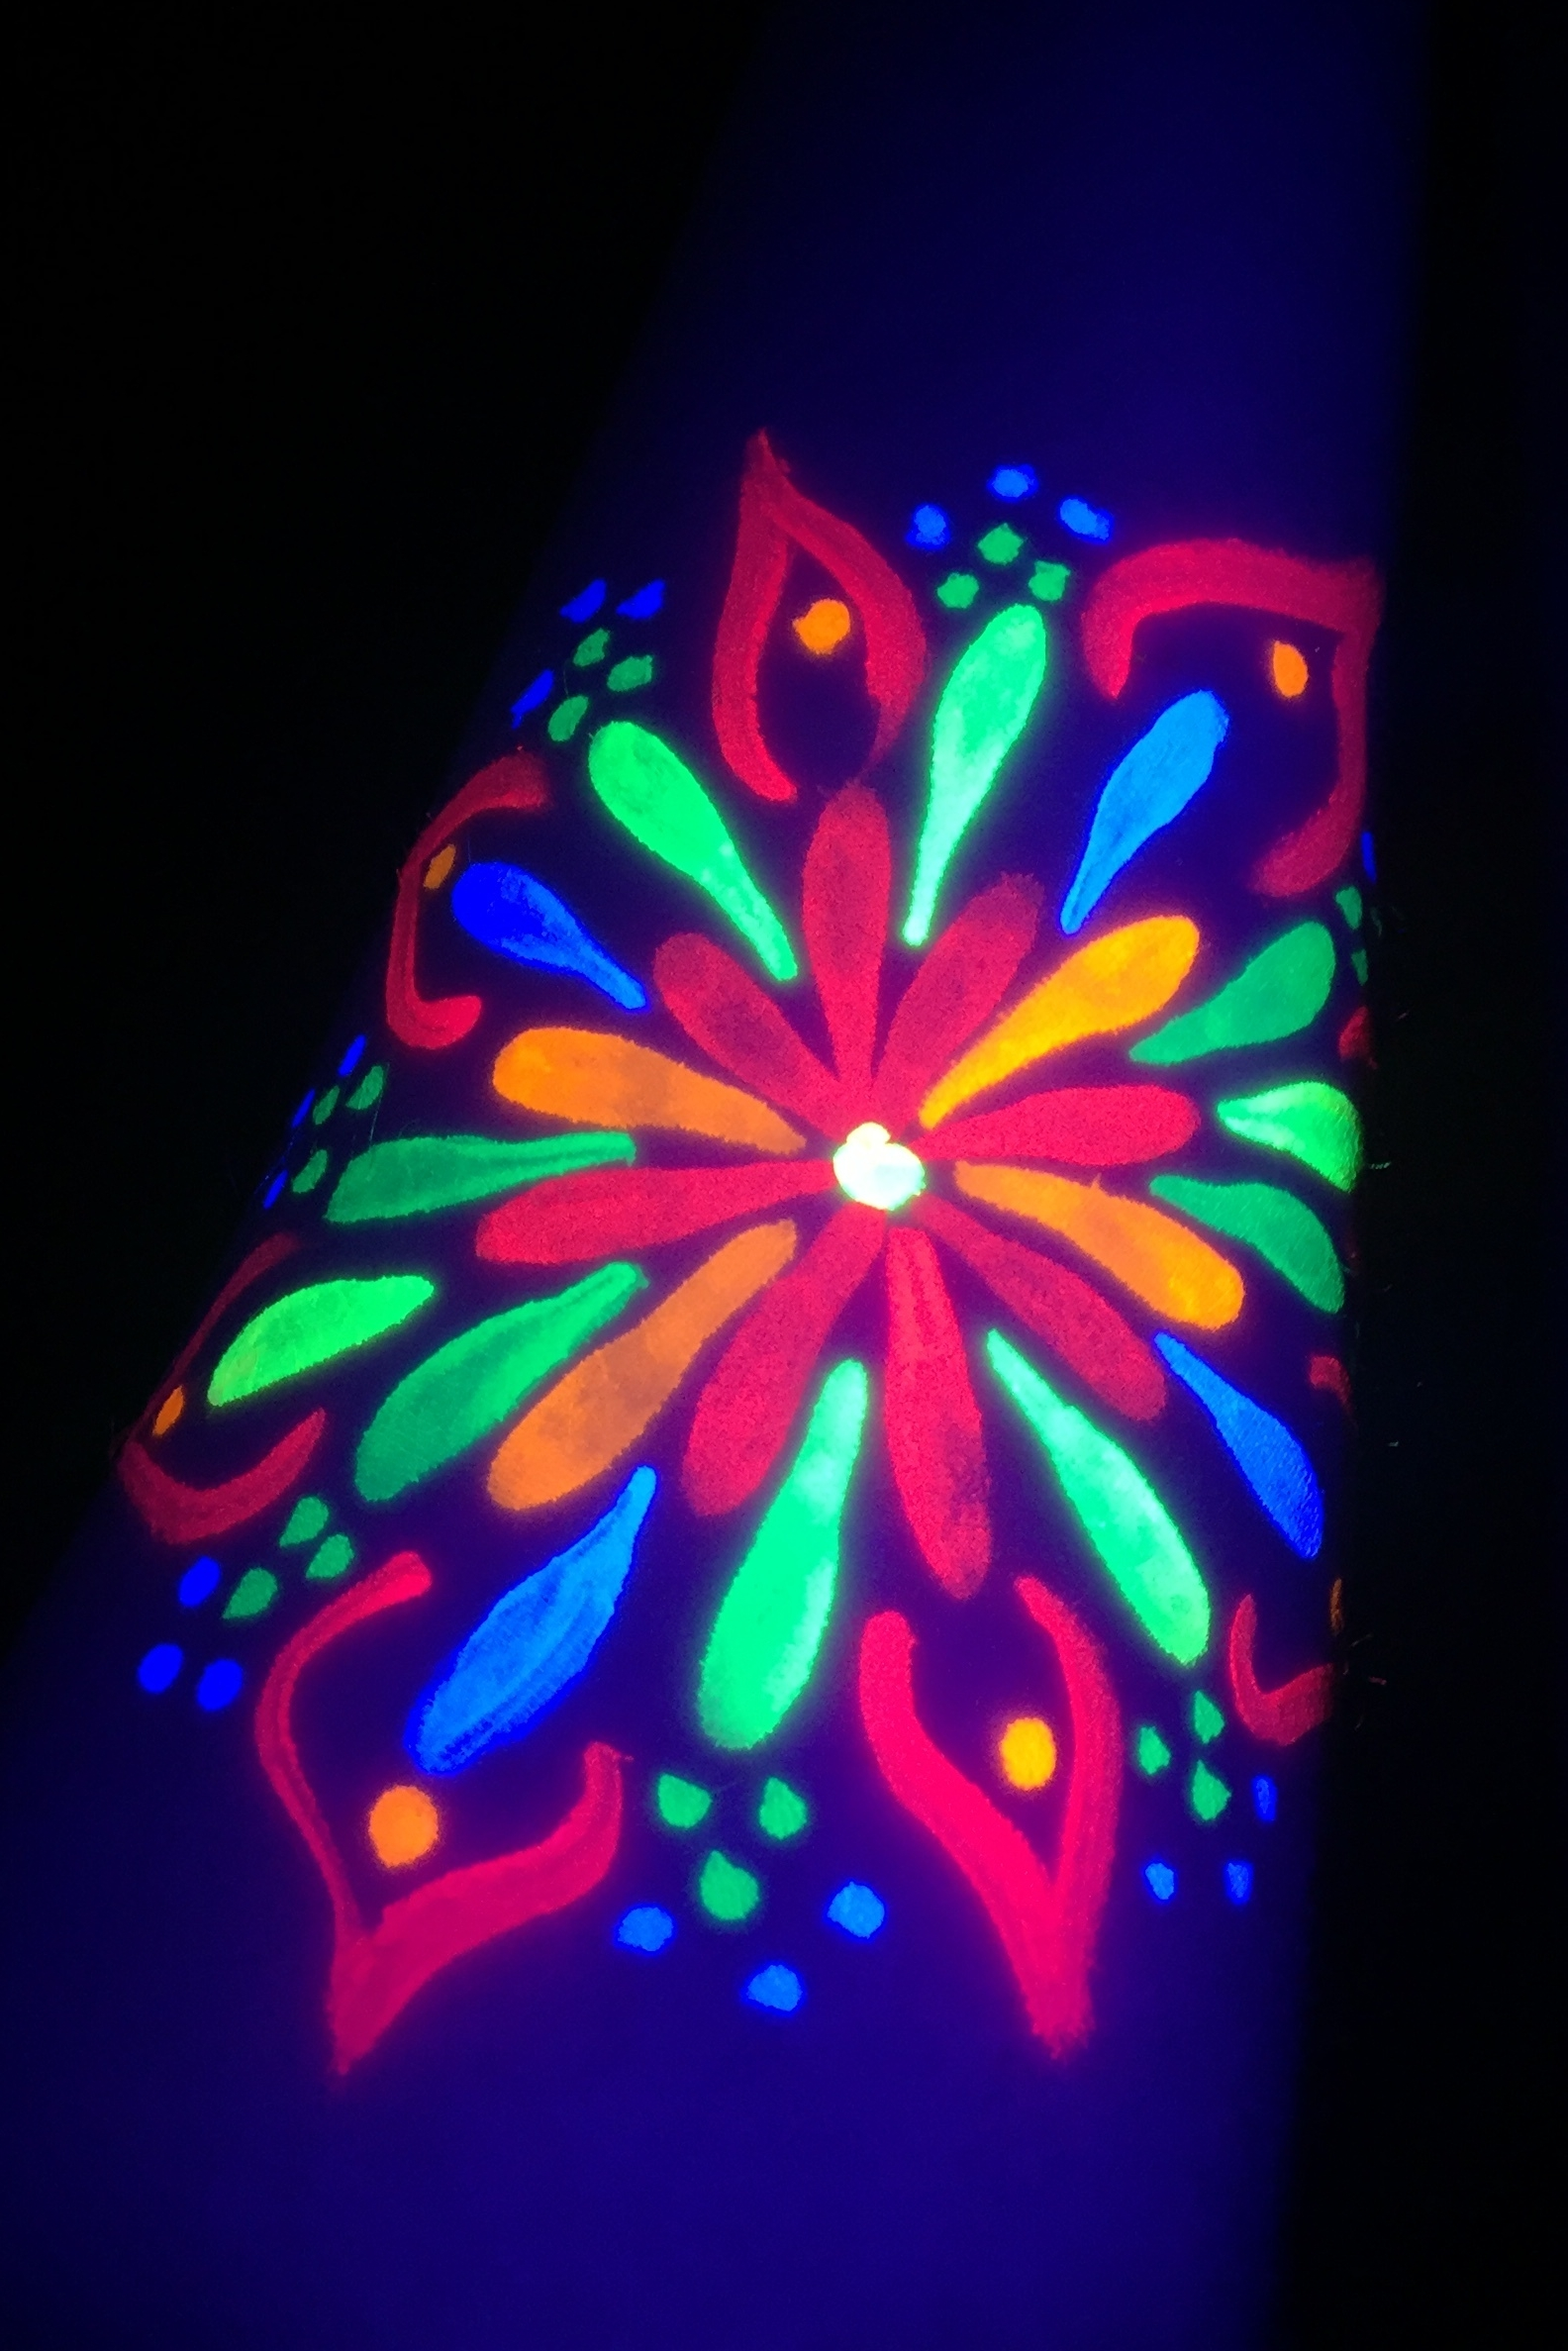 Blacklight / UV Style Arm Art is Popular in Los Angeles!